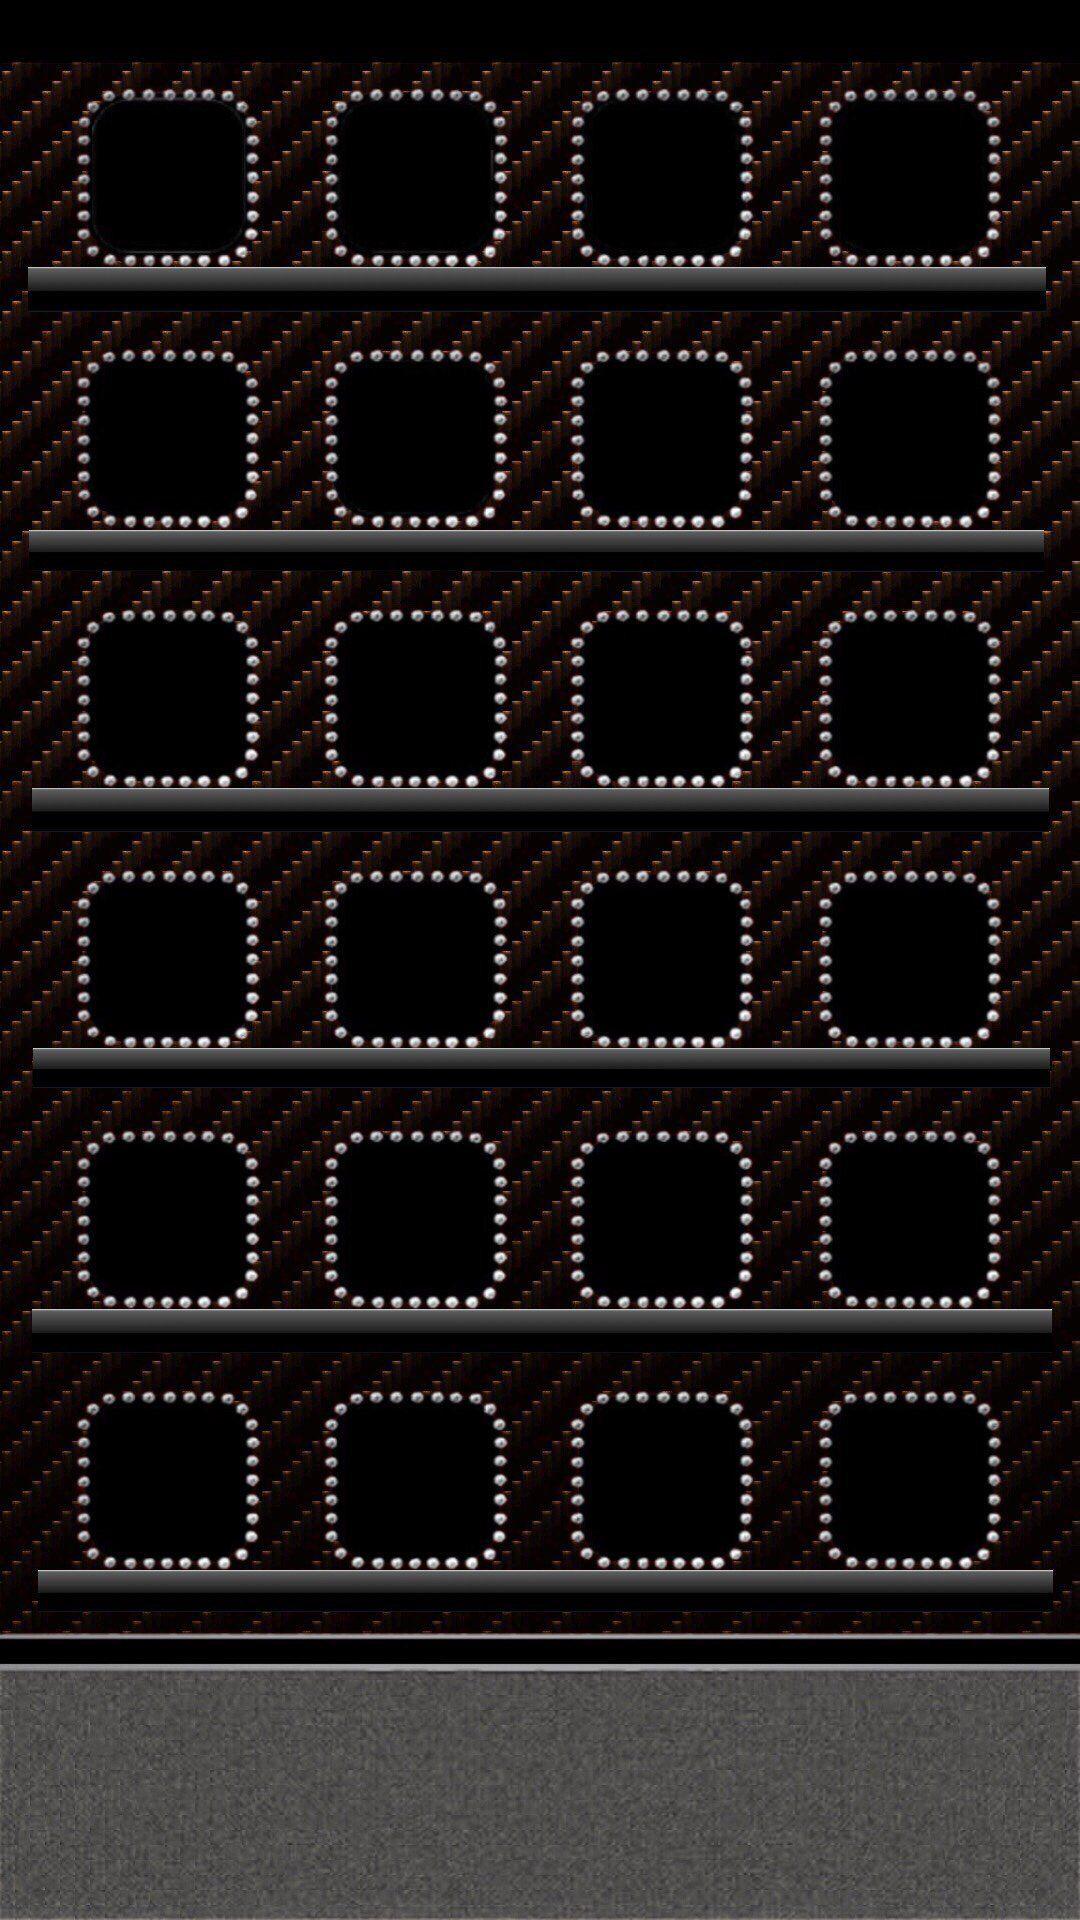 65 Iphone 7 Plus 4k Wallpapers Download At Wallpaperbro Hd Wallpaper Iphone Iphone 7 Plus Wallpaper Apple Wallpaper Iphone 7 plus home screen wallpaper hd